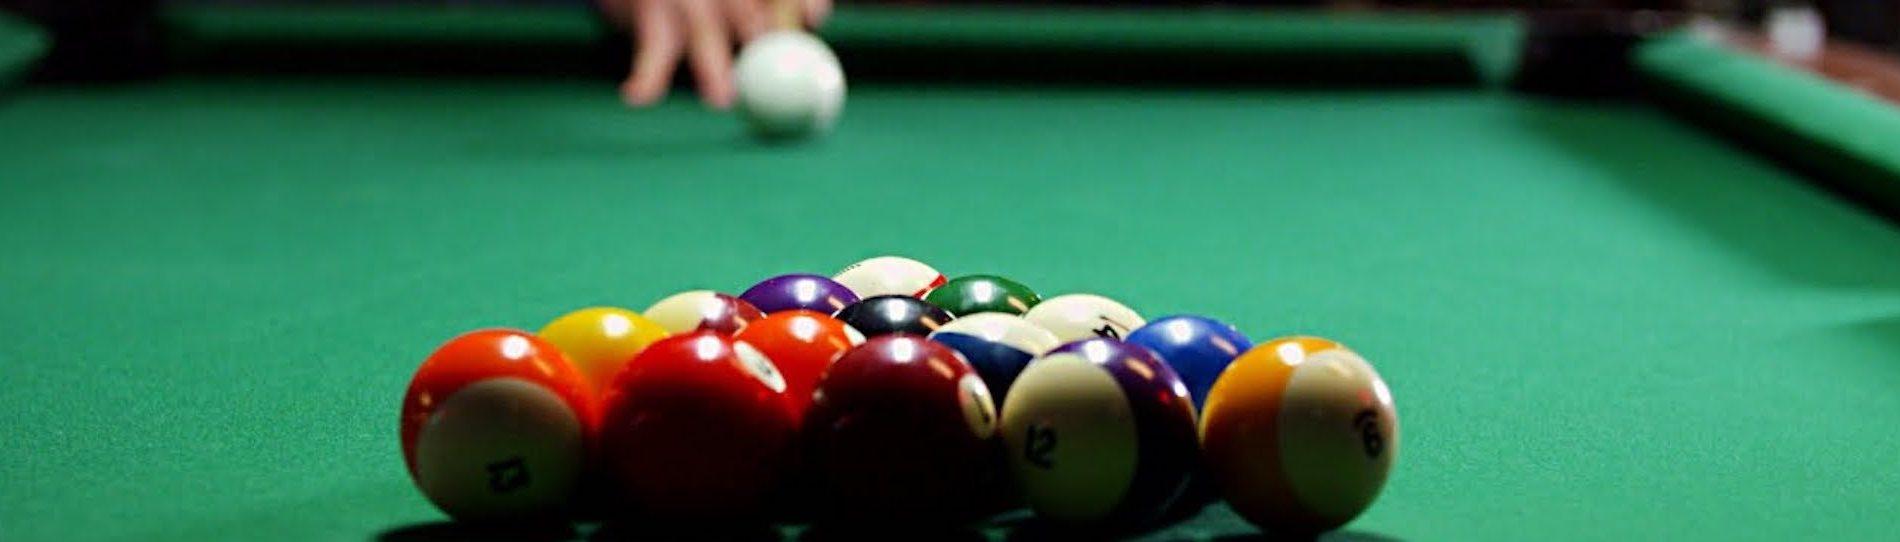 buck playing pool